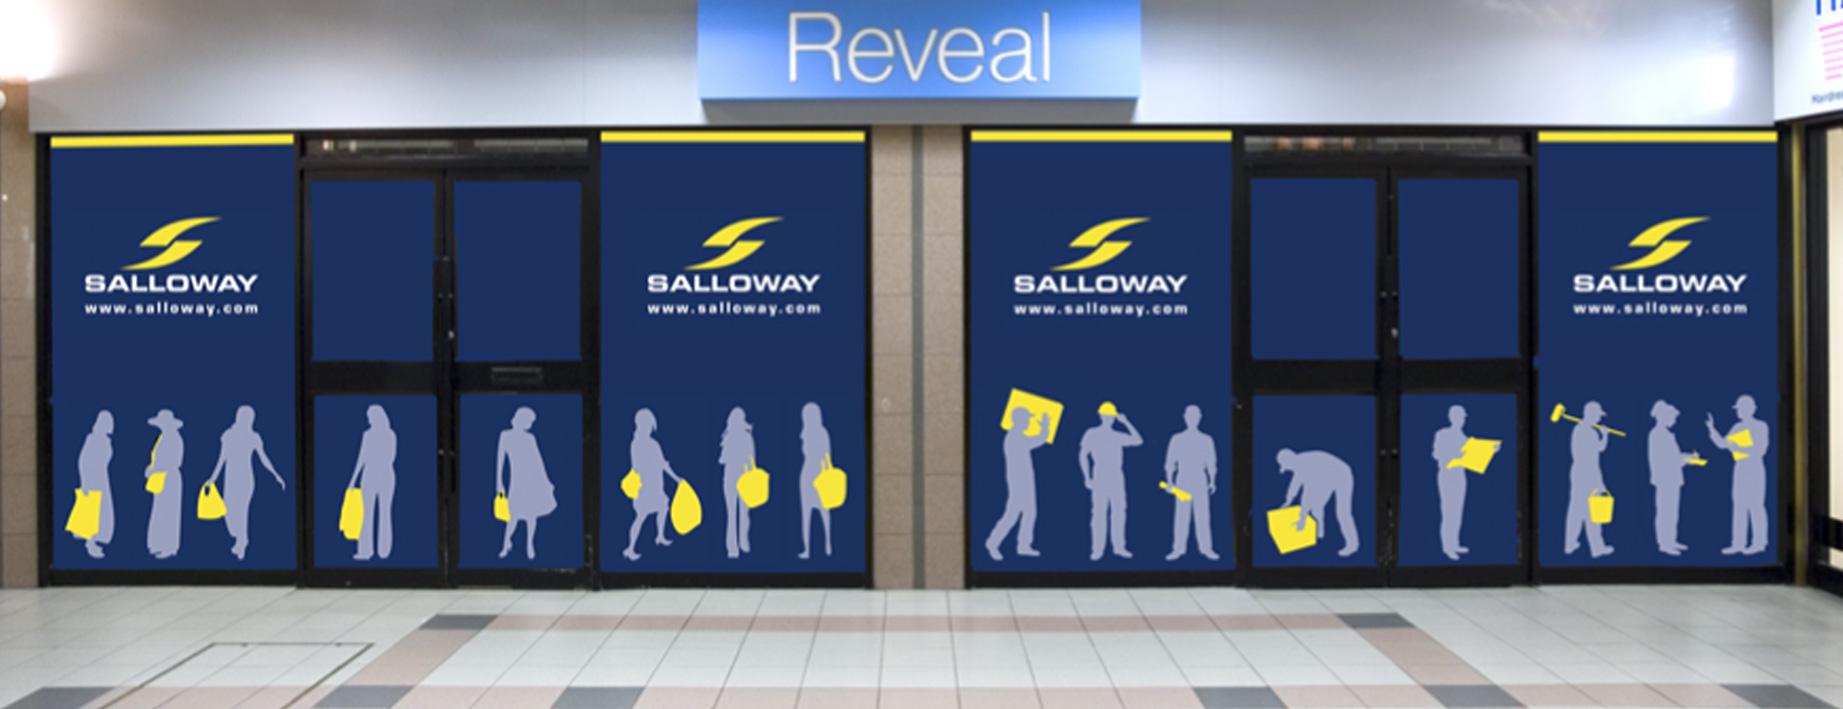 Salloway Property Consultancy window graphics